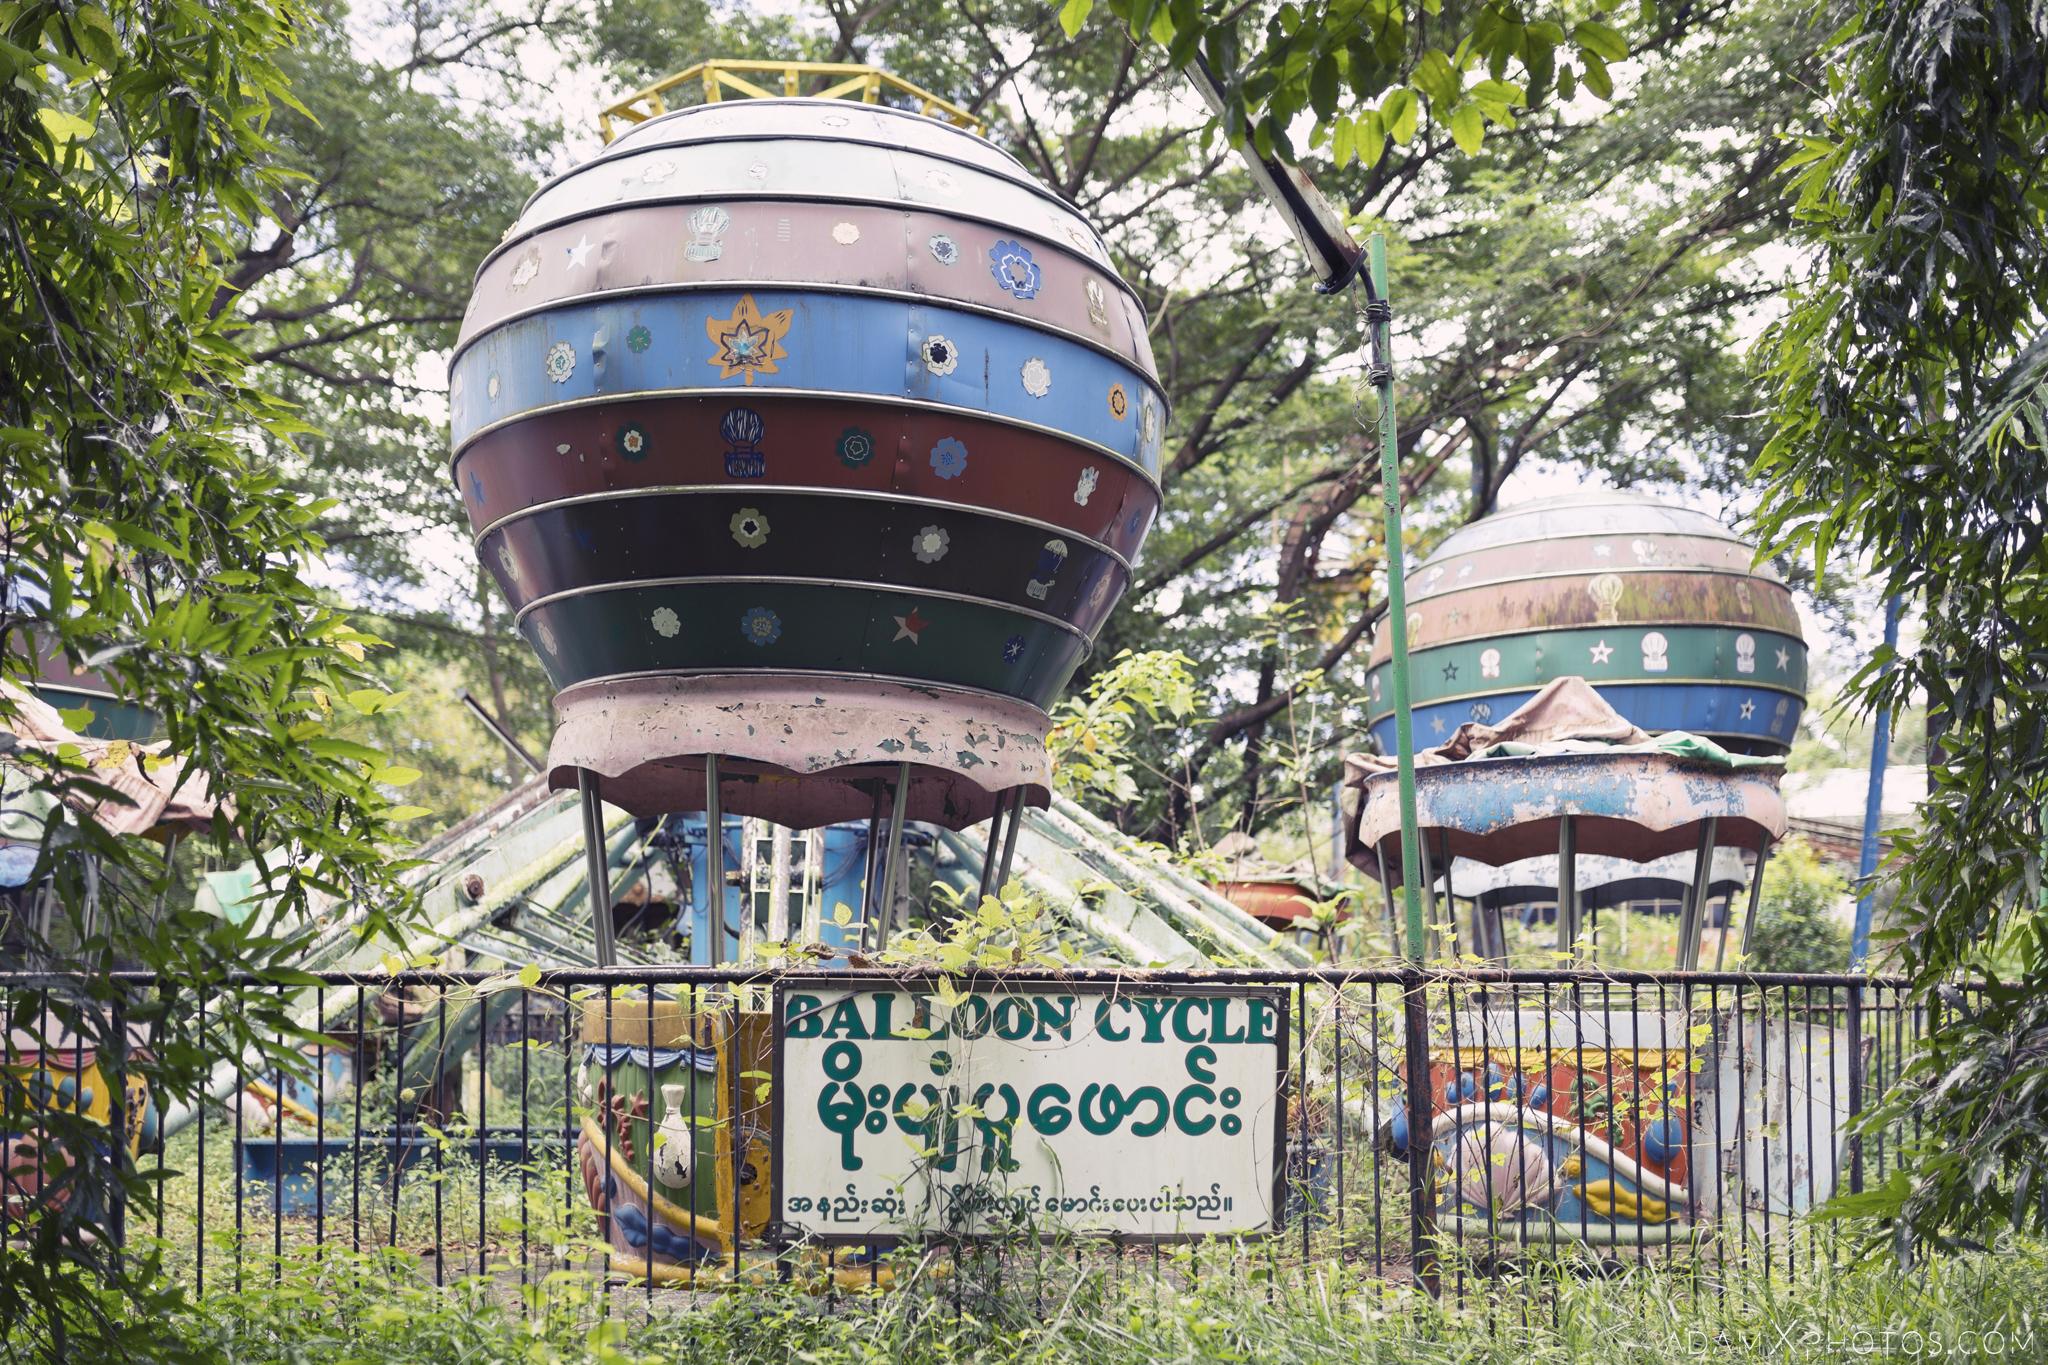 Balloon Cycle ride Happy World Theme Park Amusement Park Fairground Myanmar Burma Yangon Rangoon Urbex Adam X Urban Exploration Access 2016 Abandoned decay lost forgotten derelict location creepy haunting eerie